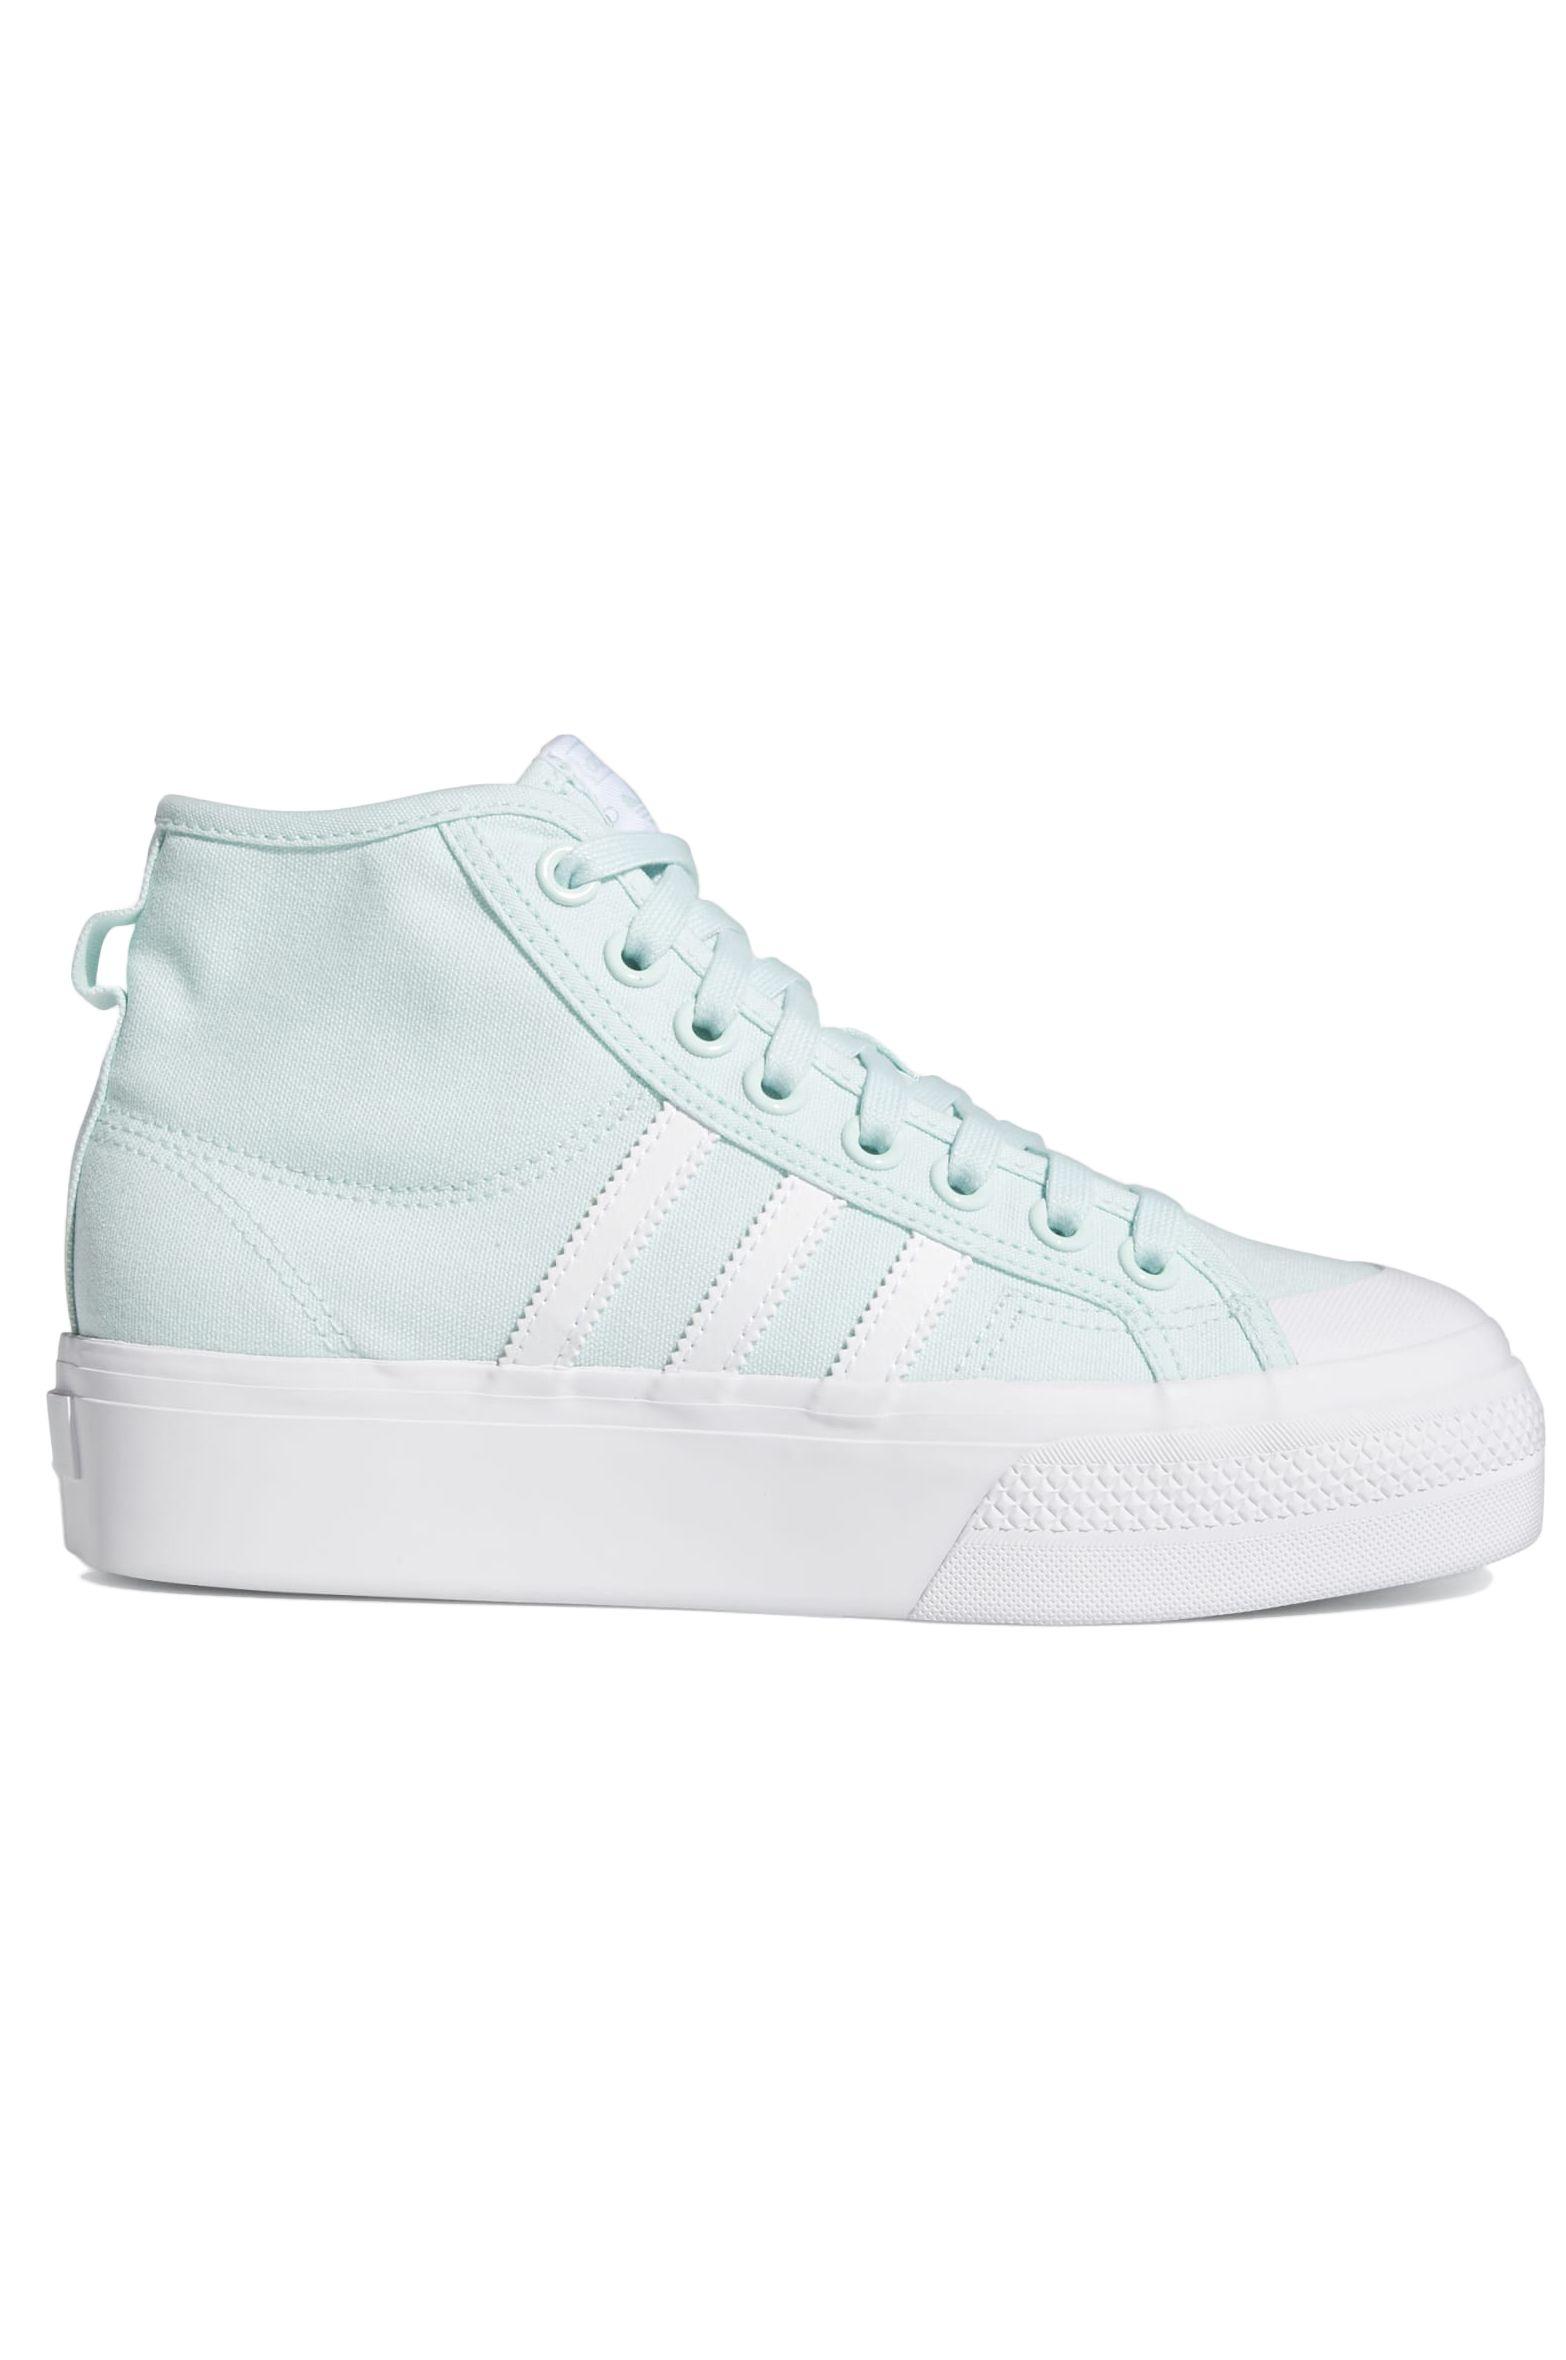 Adidas Shoes NIZZA PLATFORM MID W Halomint